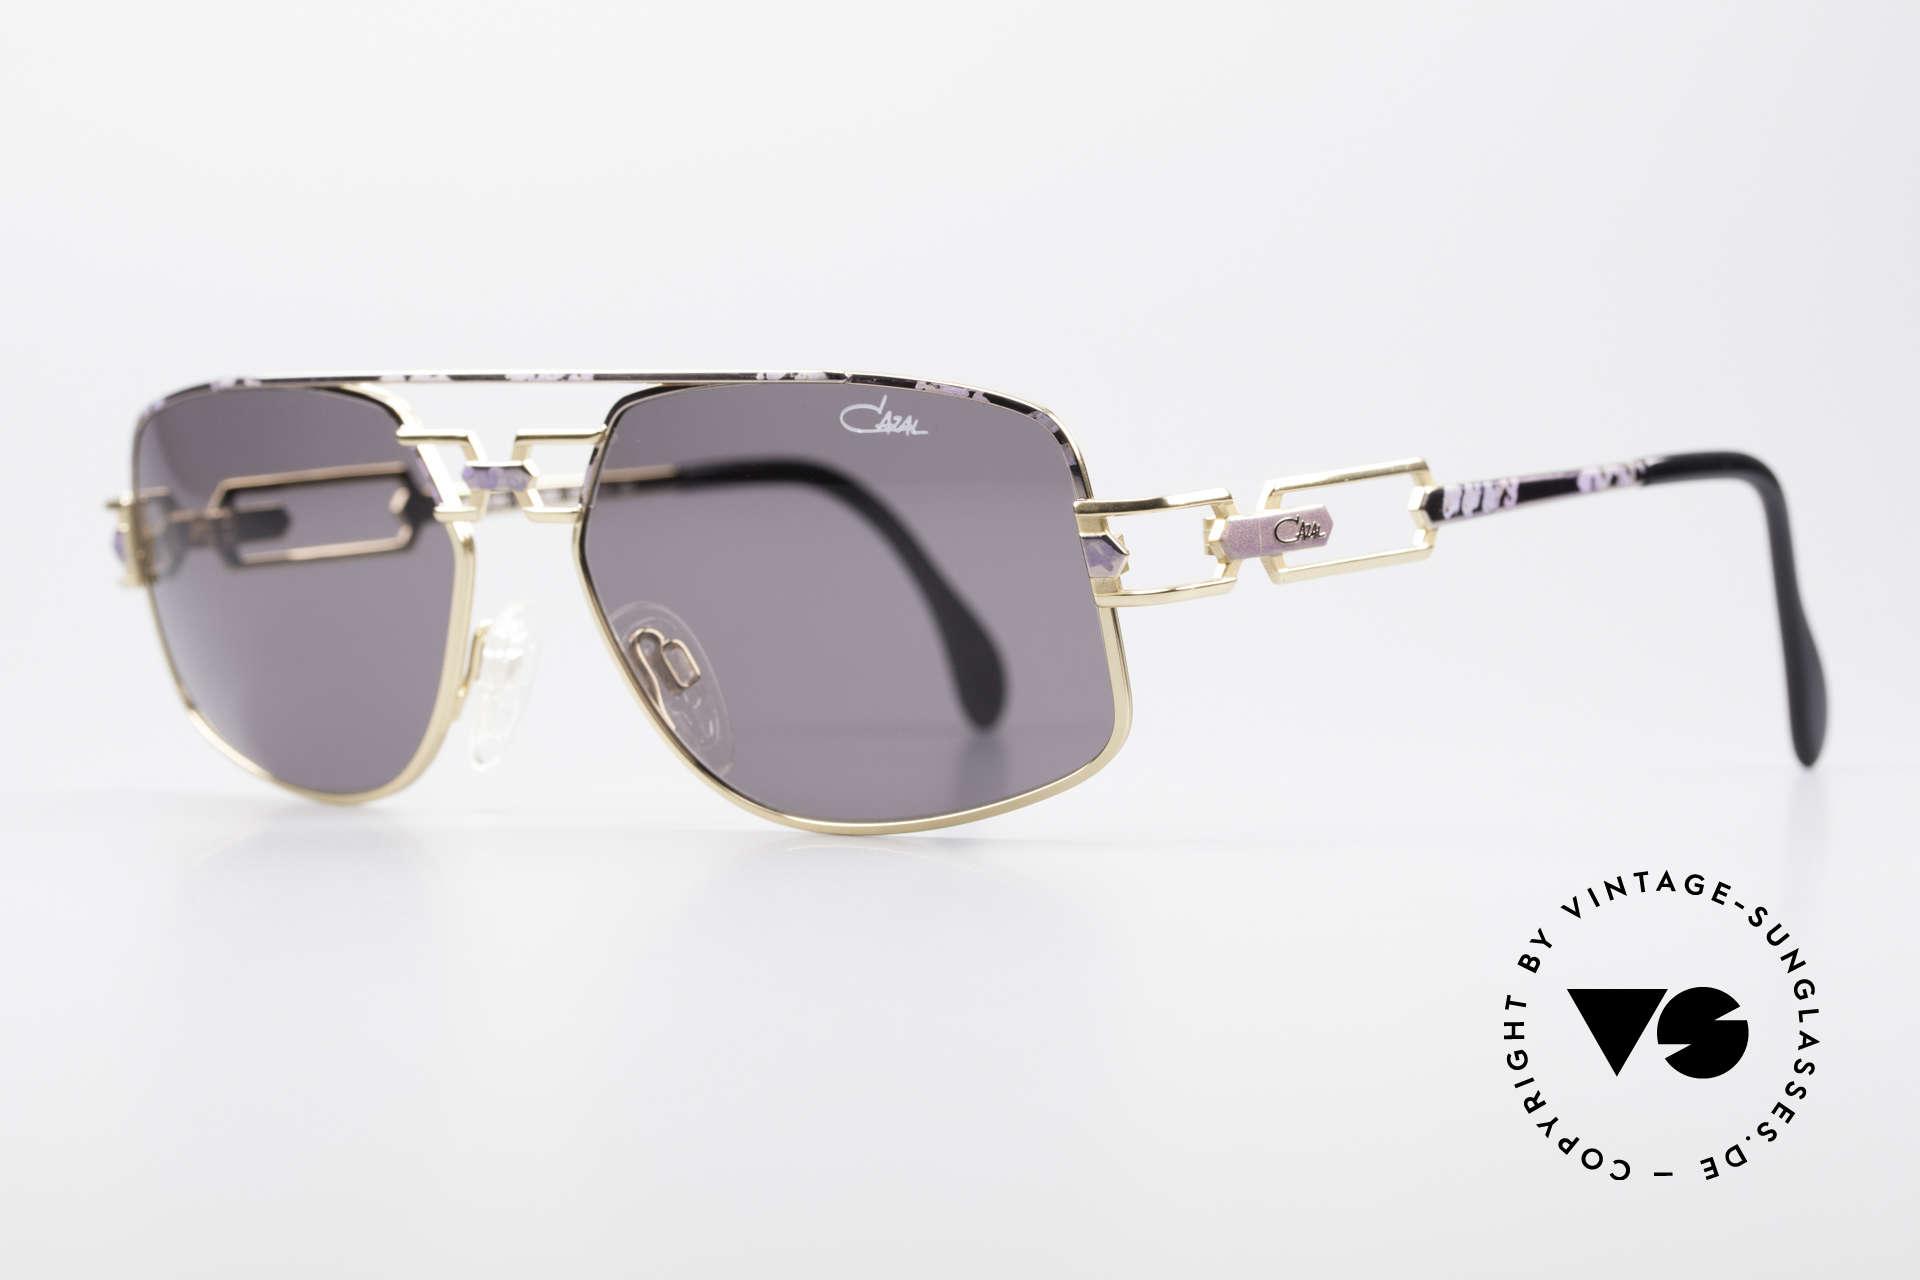 Cazal 972 True Vintage Shades No Retro, extraordinary frame finish: lilac mat / gold; imaginative, Made for Men and Women